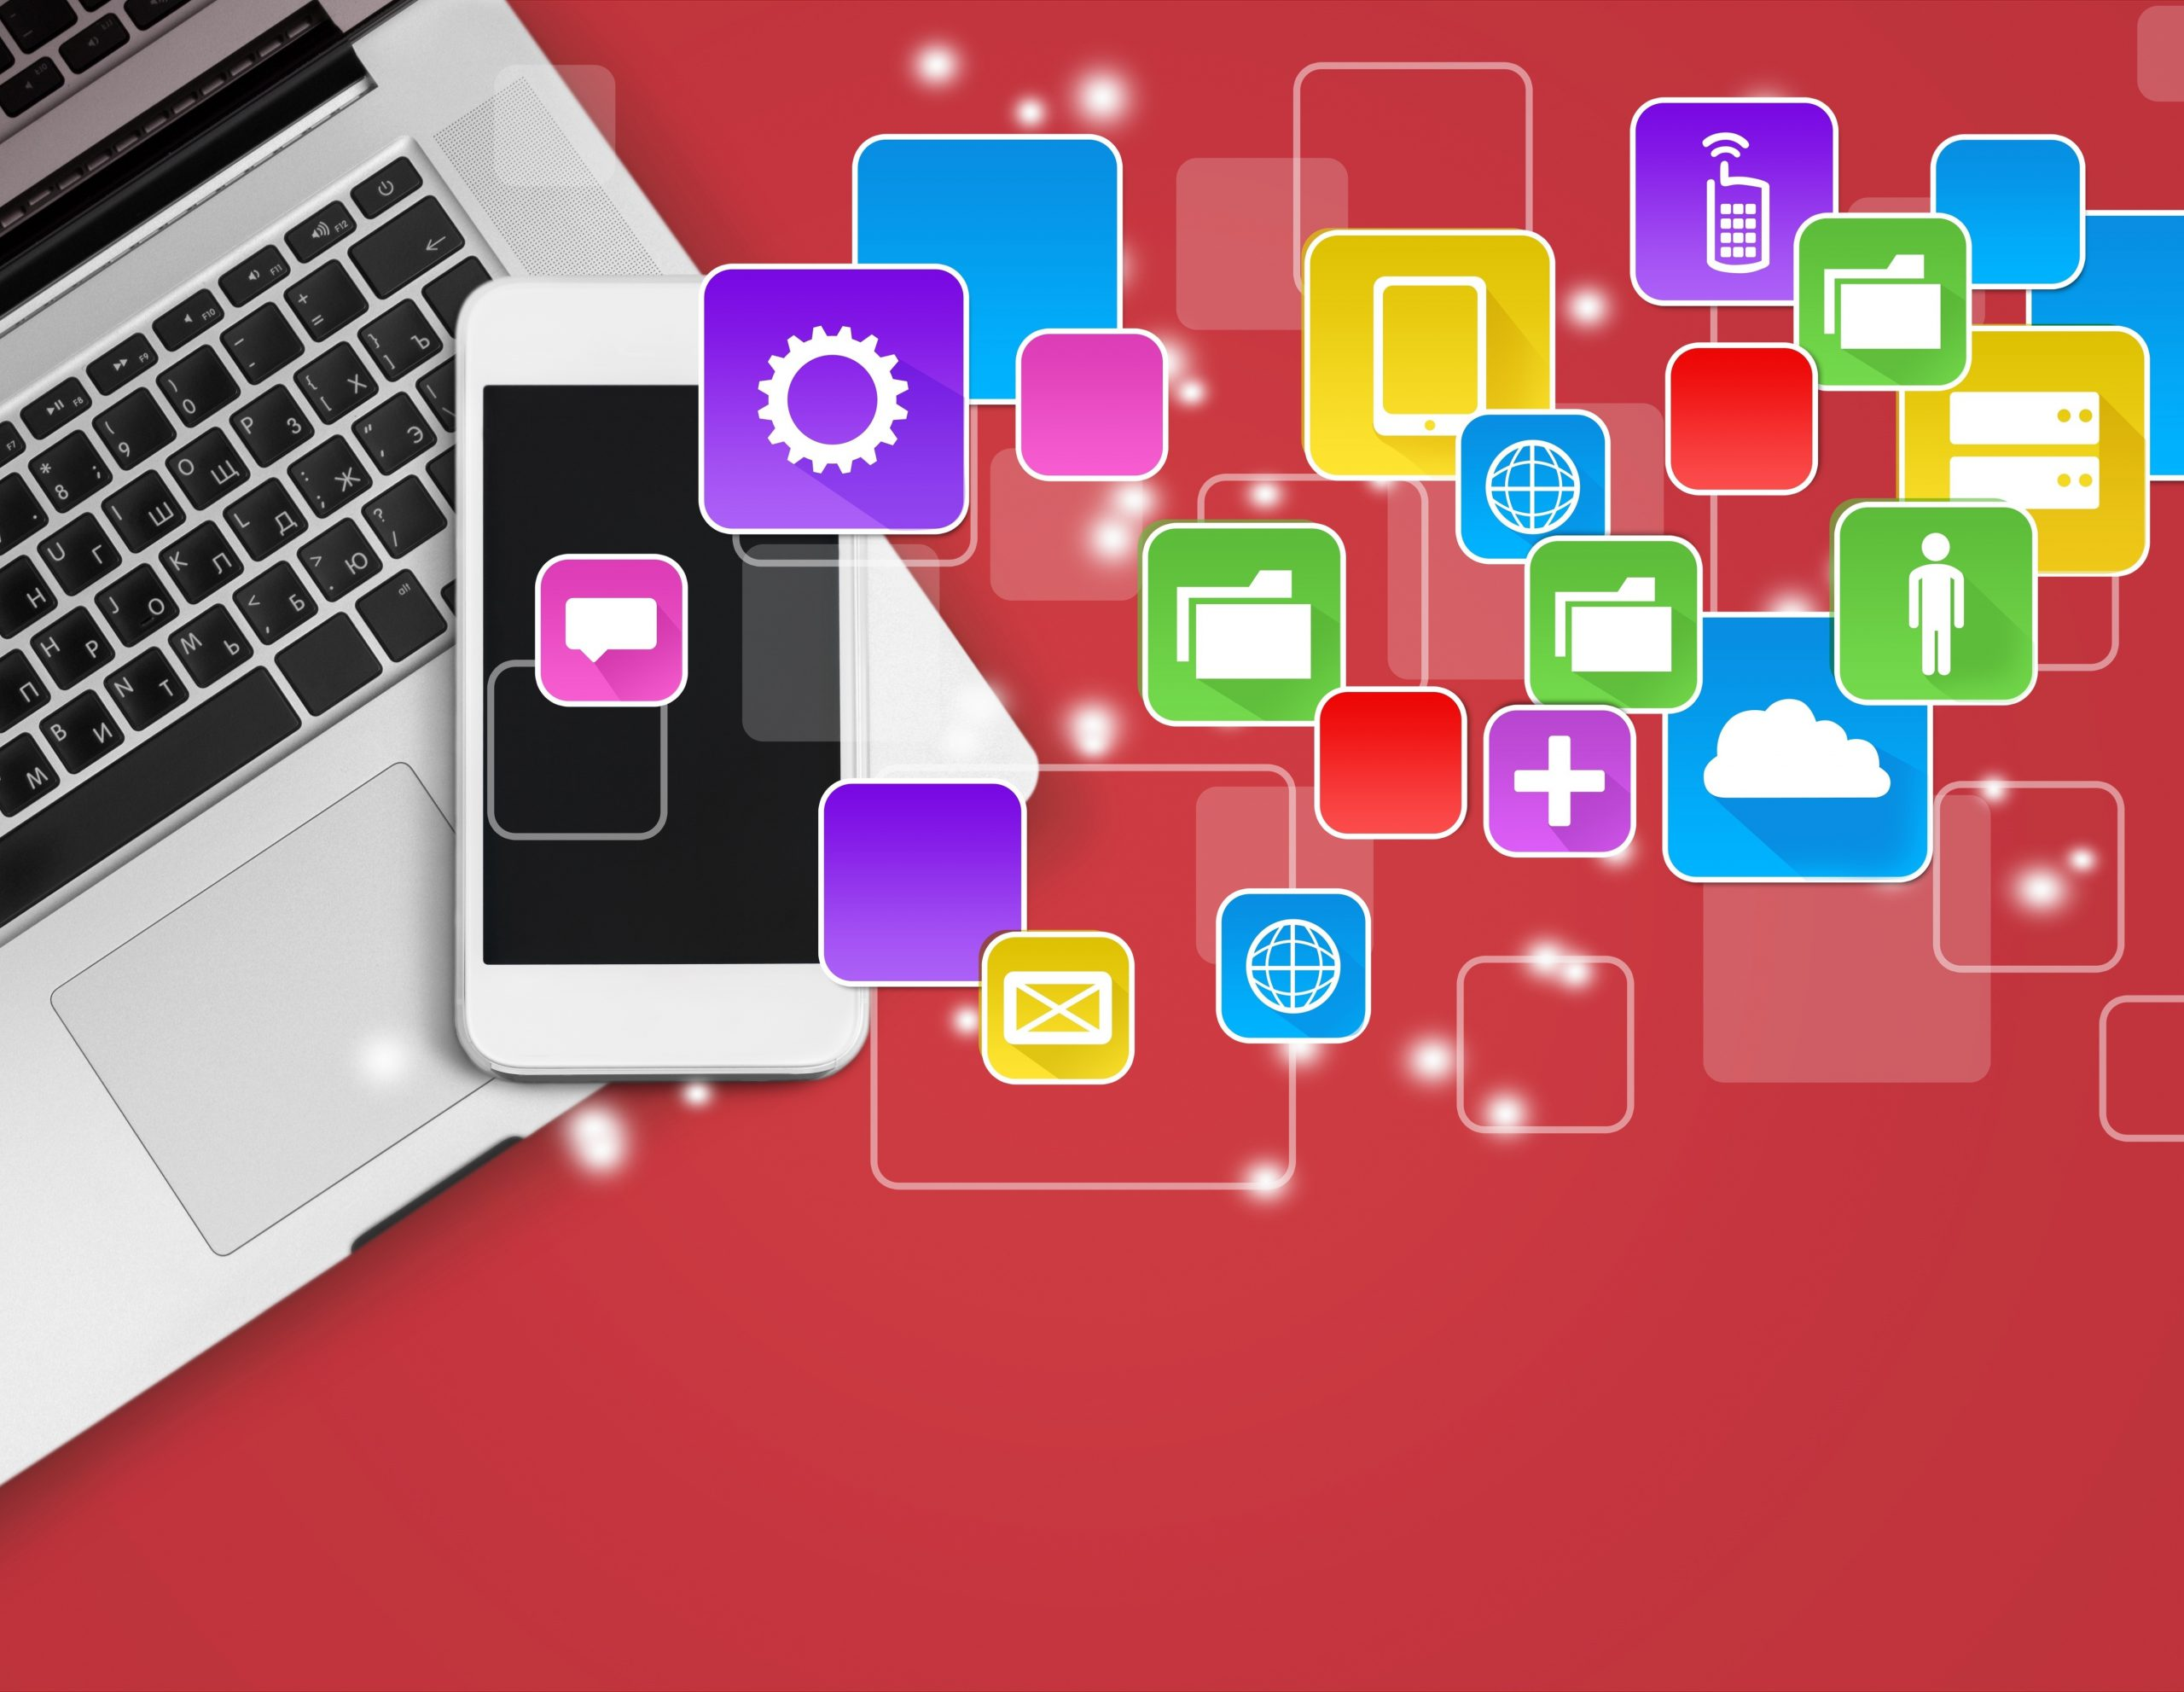 office 365 rebranded as microsoft 365